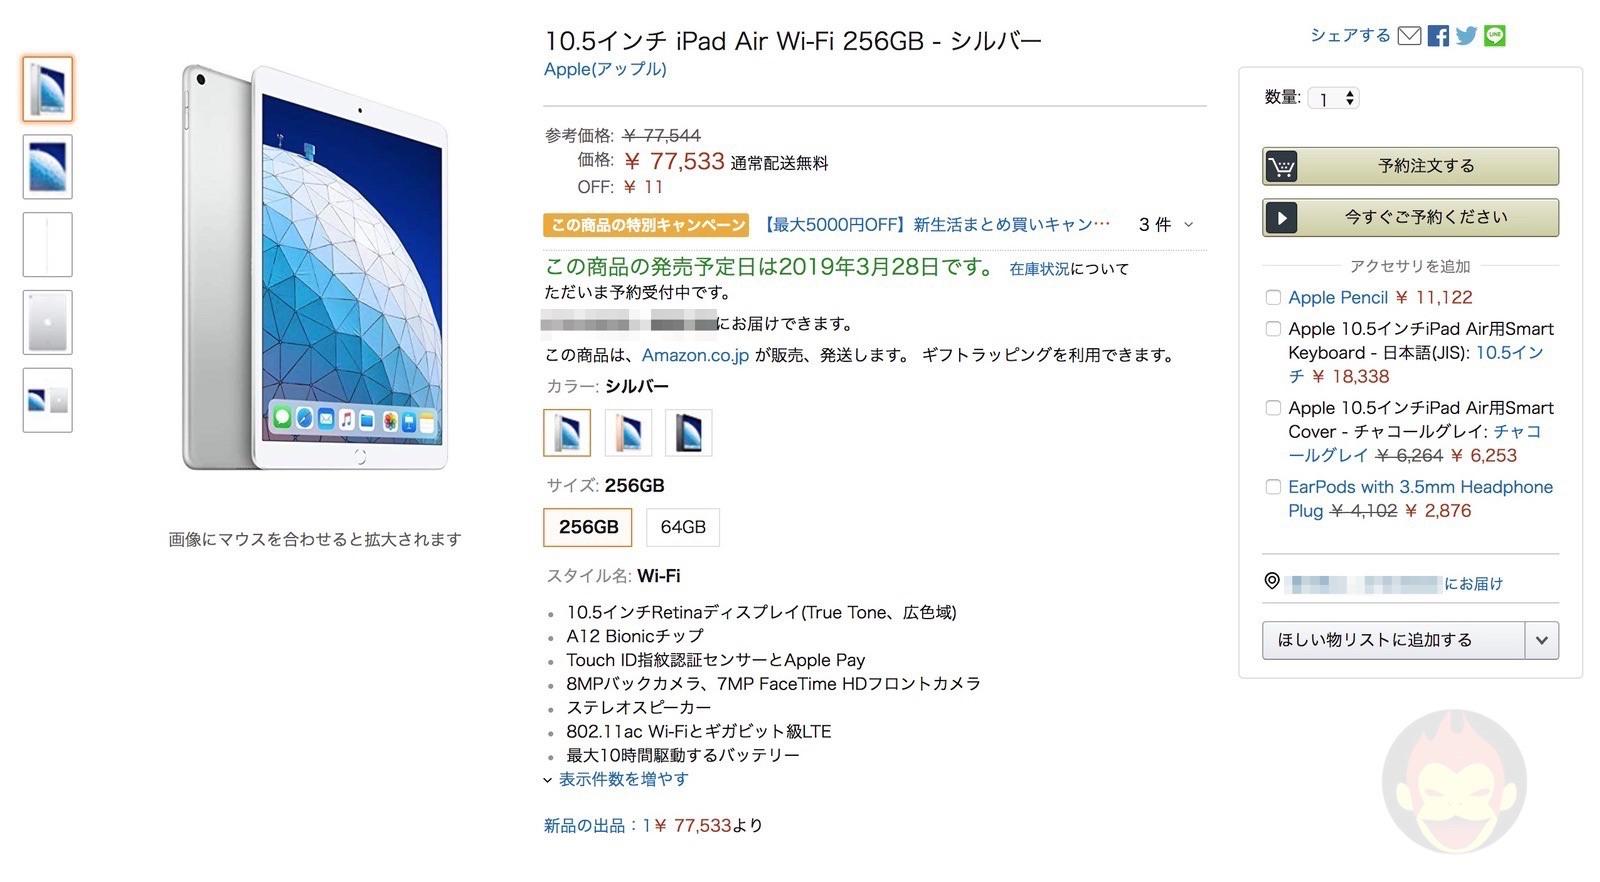 New-iPad-Air-on-Sale-at-Amazon-01.jpg